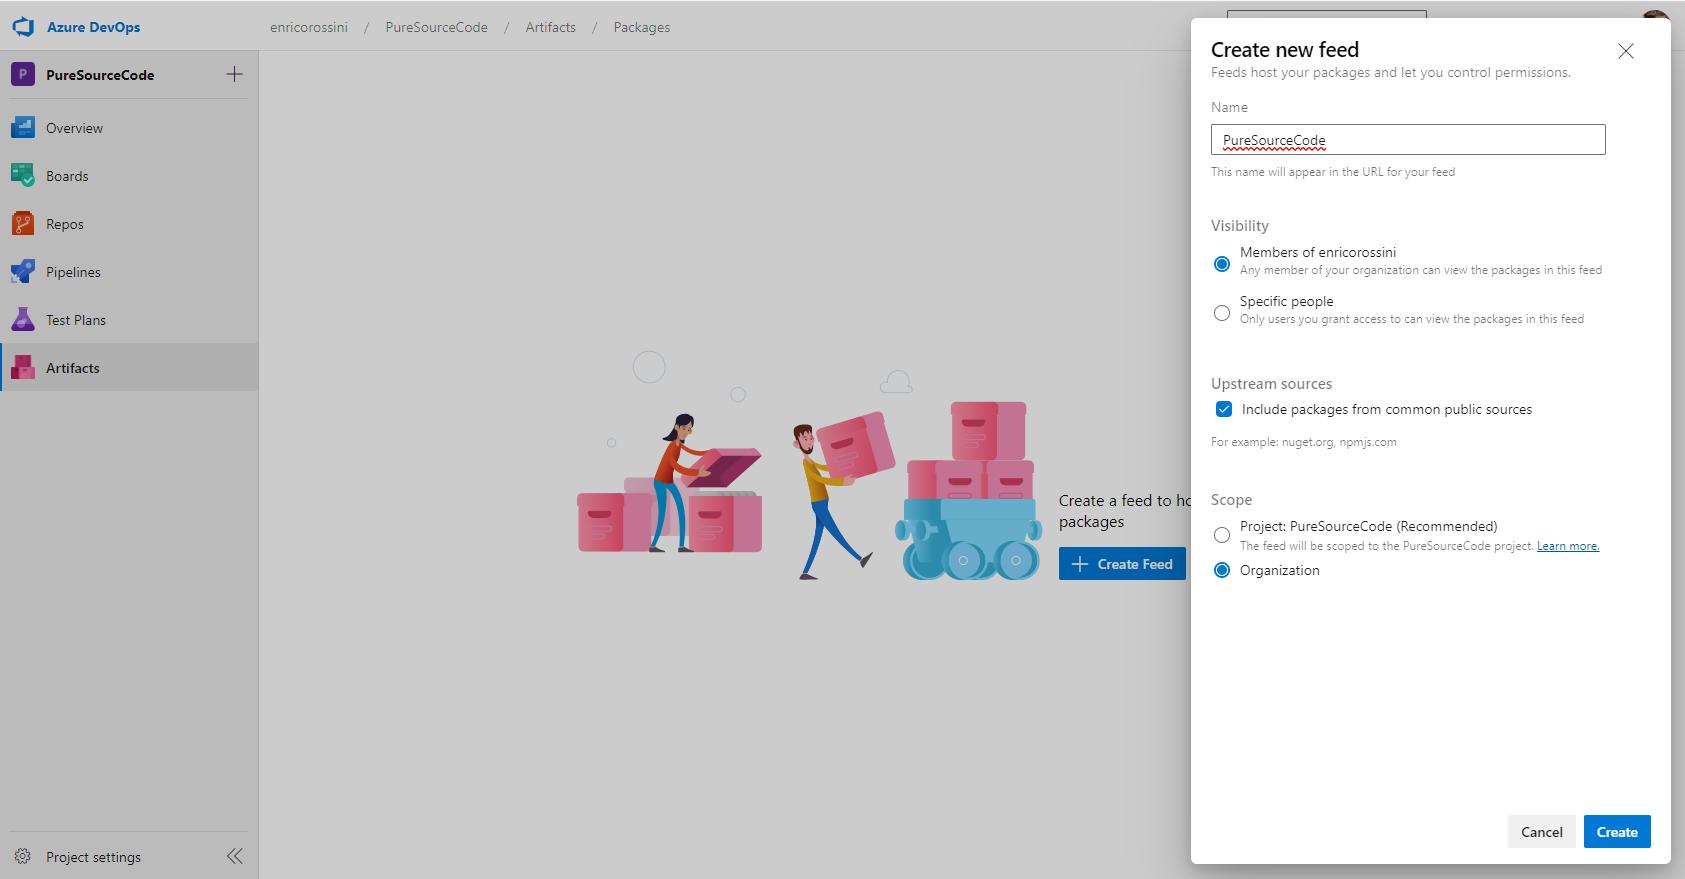 Create new feed in Azure DevOps Artifacts - NuGet package with Azure DevOps